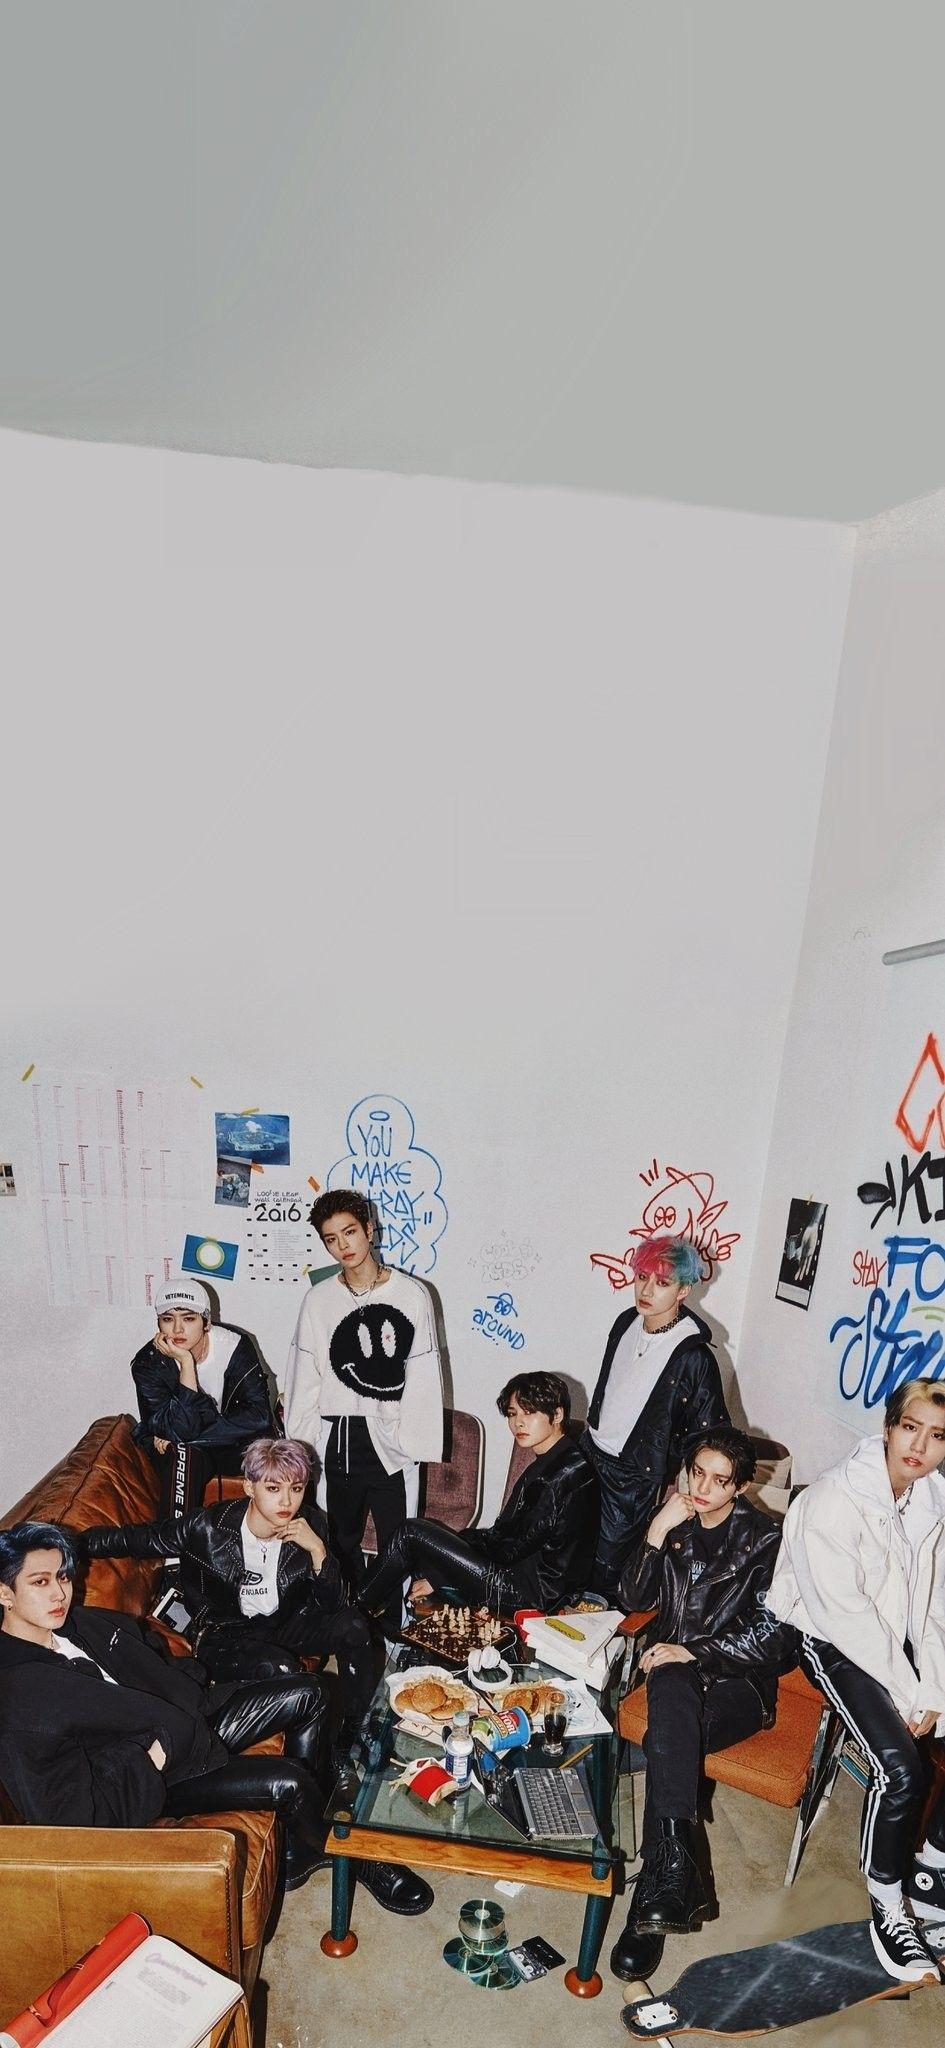 Go生 Teaser Images 6 13 2020 In 2020 Stray Kids Seungmin Kids Wallpaper Kids Groups